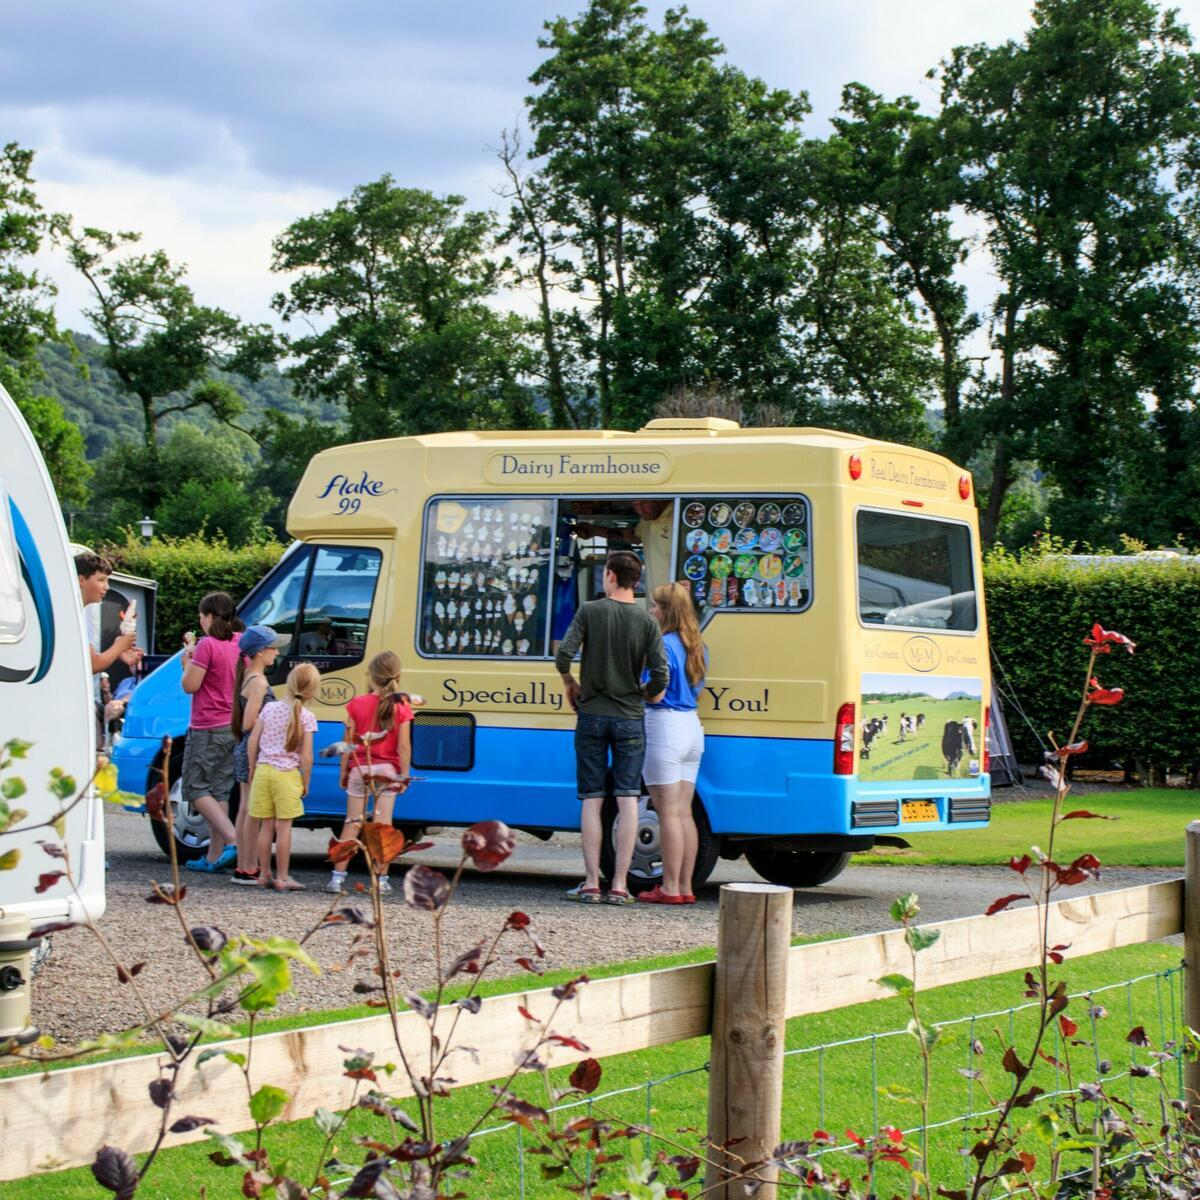 The Ice Cream Van calls